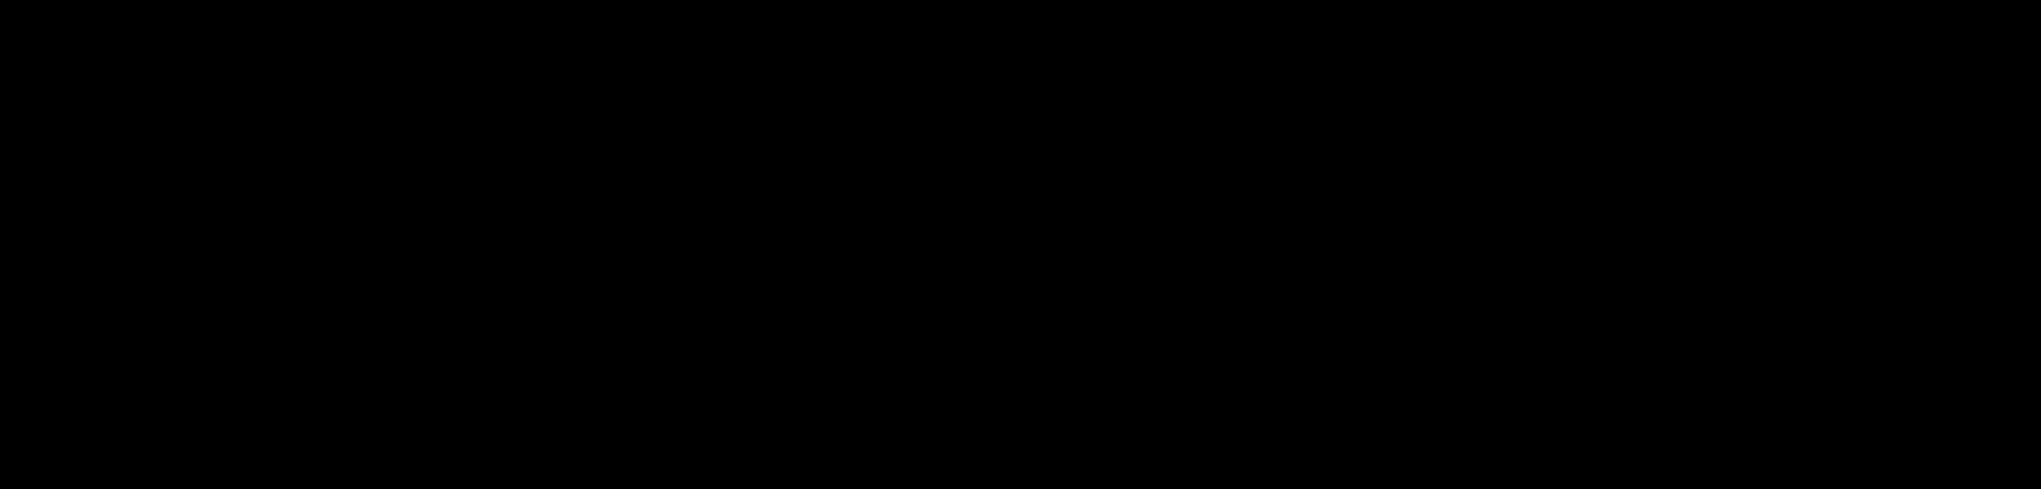 Lauren Yakiwchuk logo